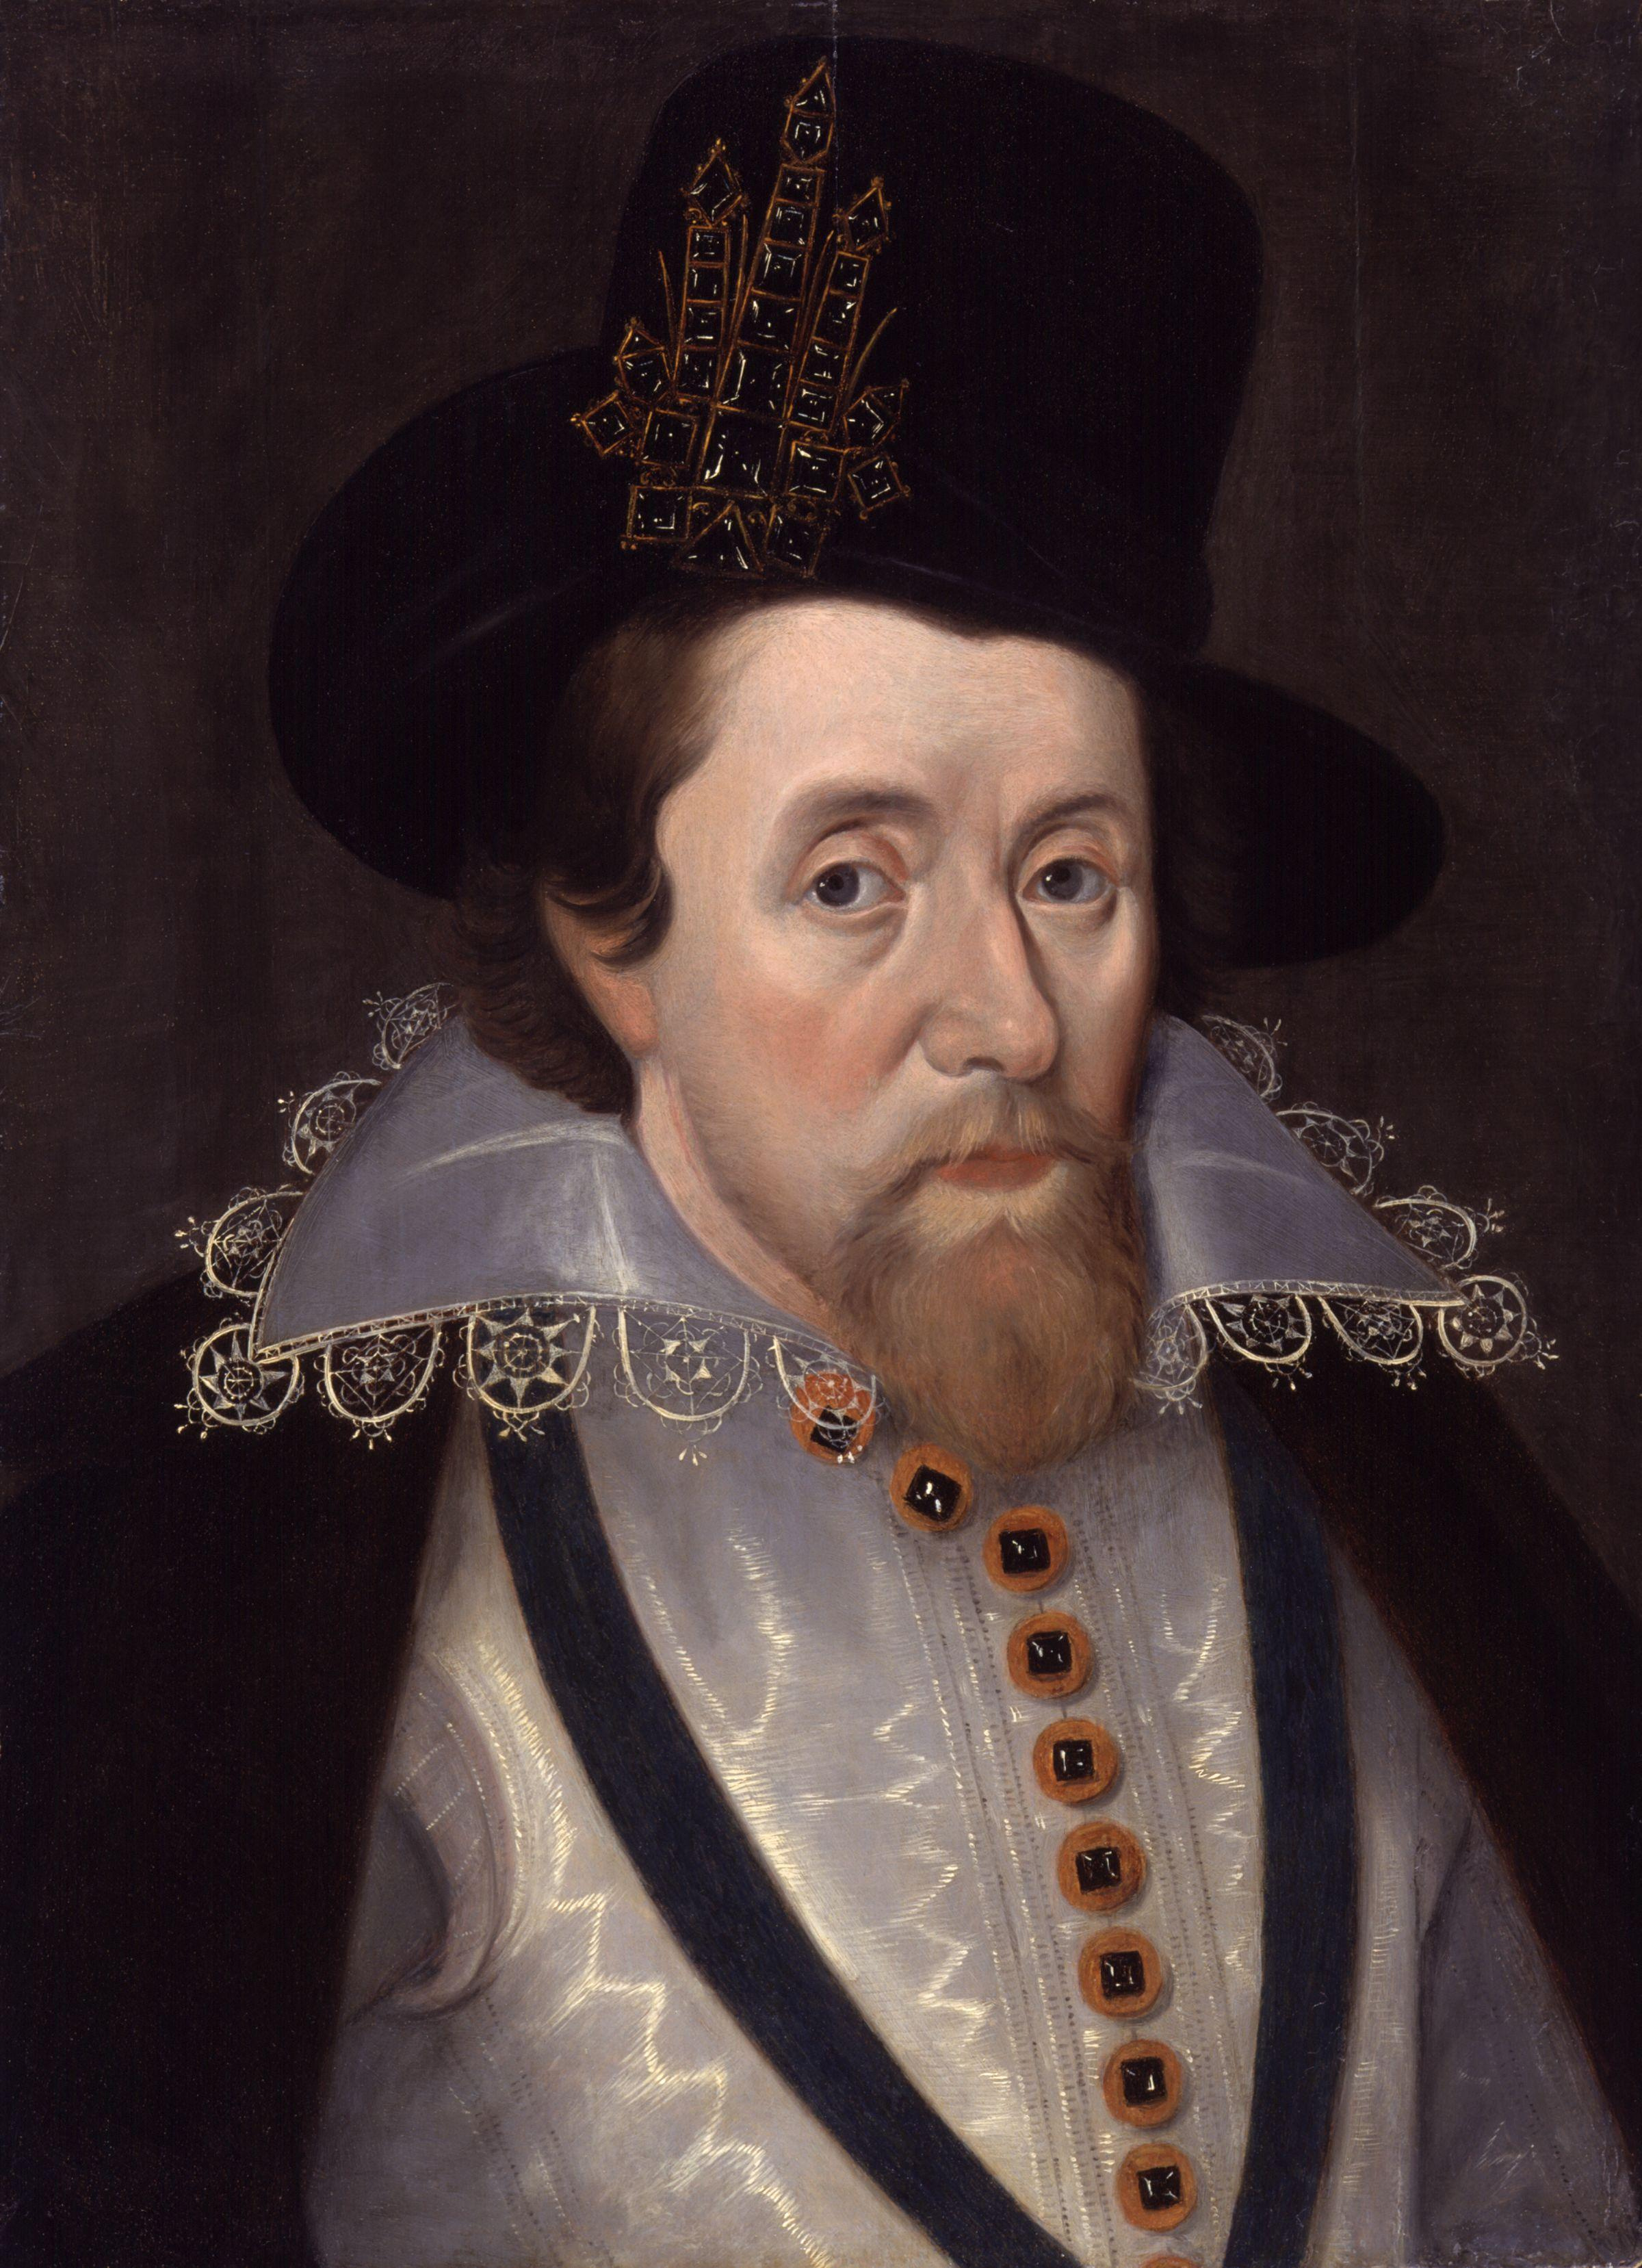 King_James_I_of_England_and_VI_of_Scotland_by_John_De_Critz_the_Elder.jpg